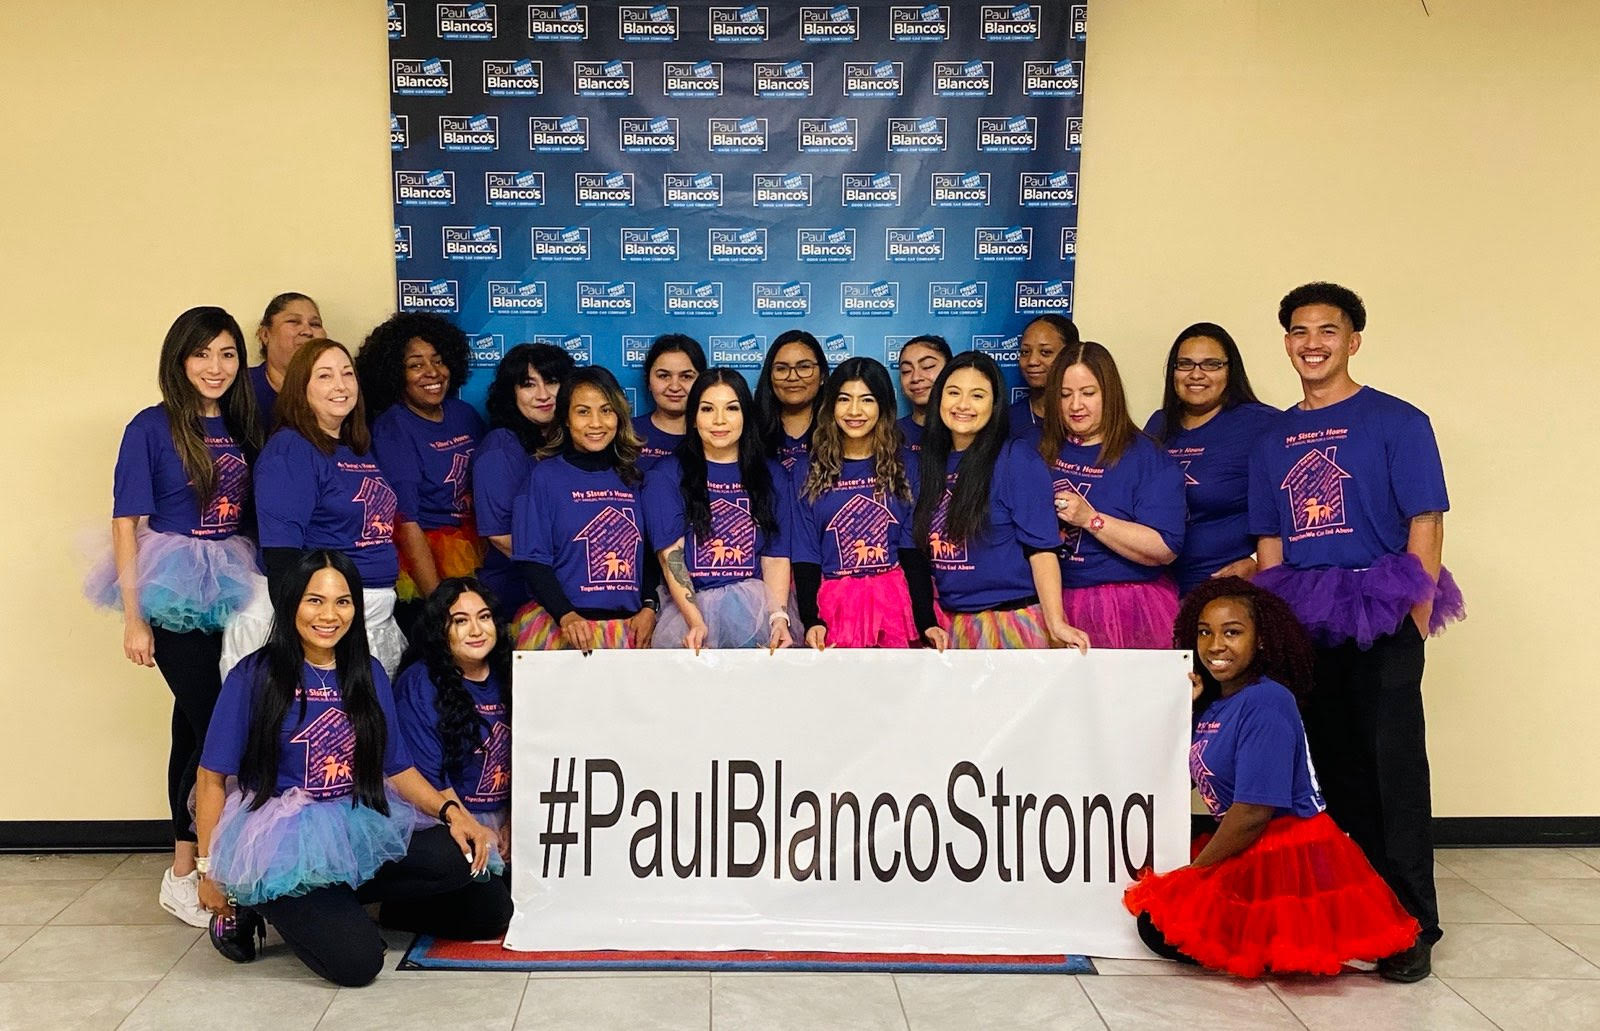 Paul Blanco's Corporate Team